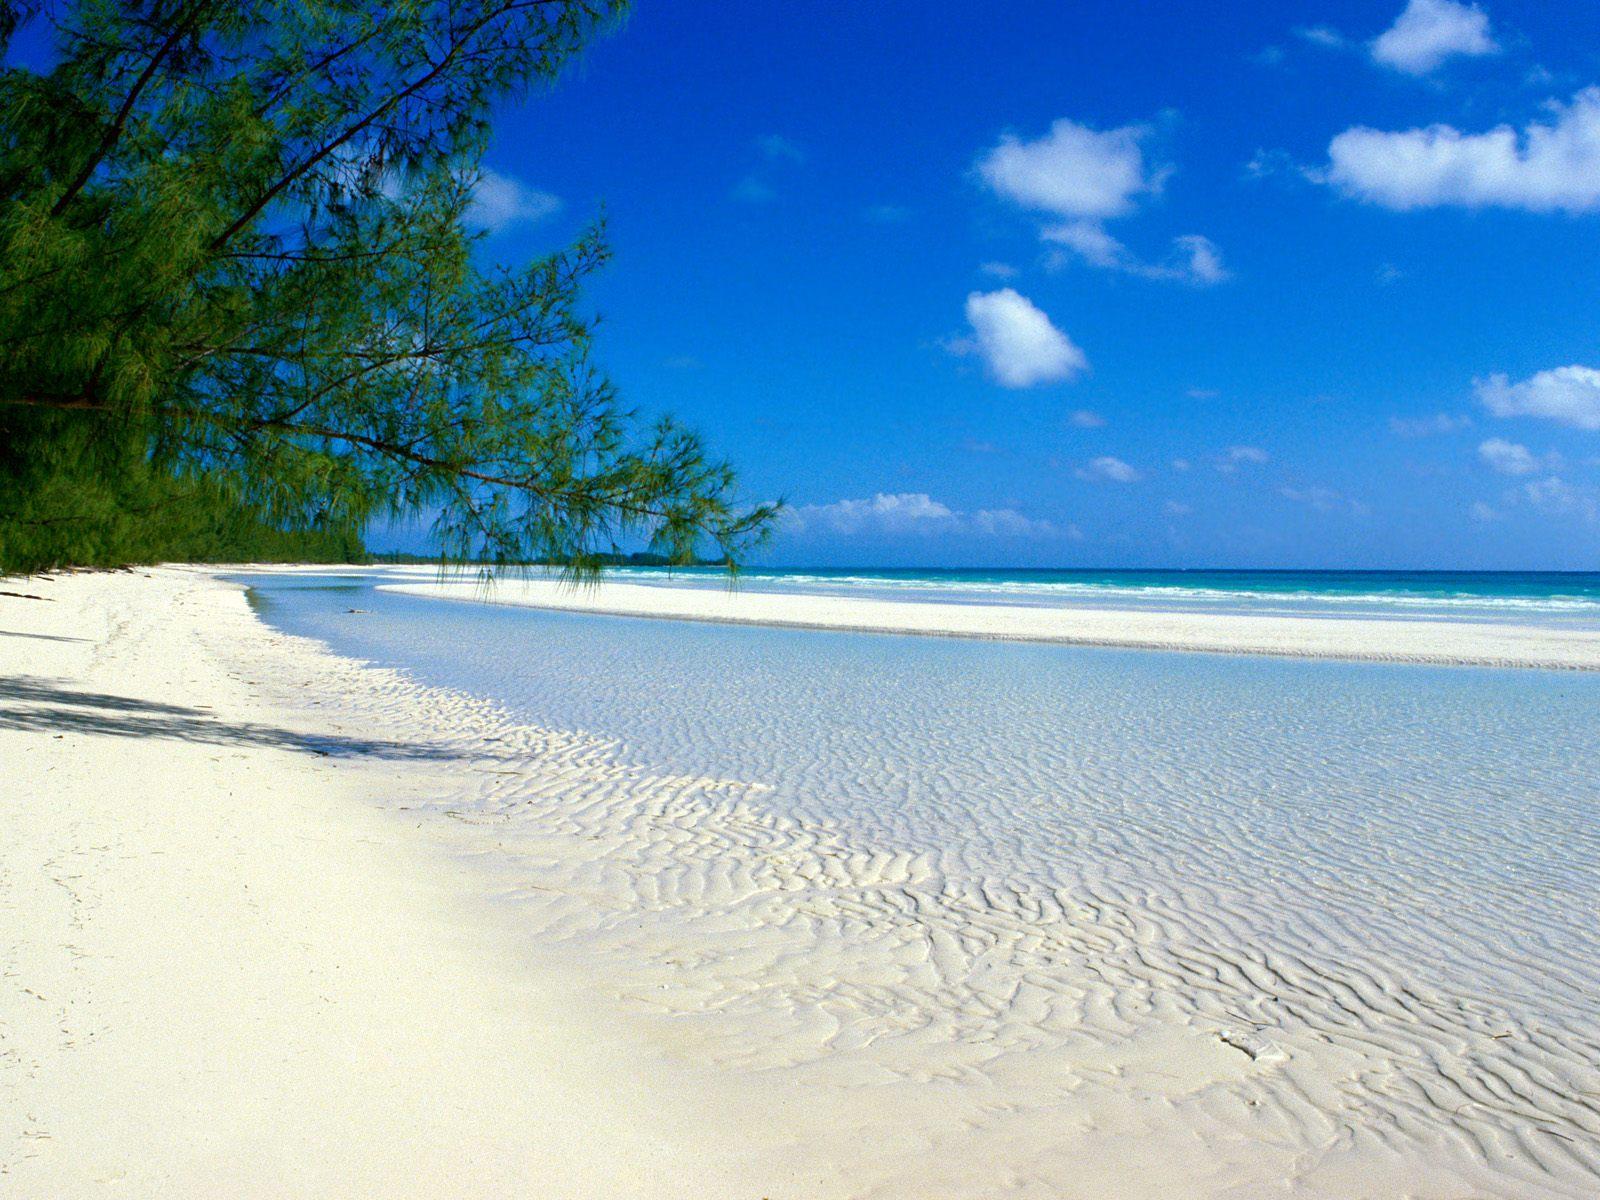 http://1.bp.blogspot.com/-EEPrPh5Mkog/TkdR5563r-I/AAAAAAAAAB4/cB04cAJTFnk/s1600/The-best-top-desktop-beach-wallpapers-hd-beach-wallpaper-34.jpg